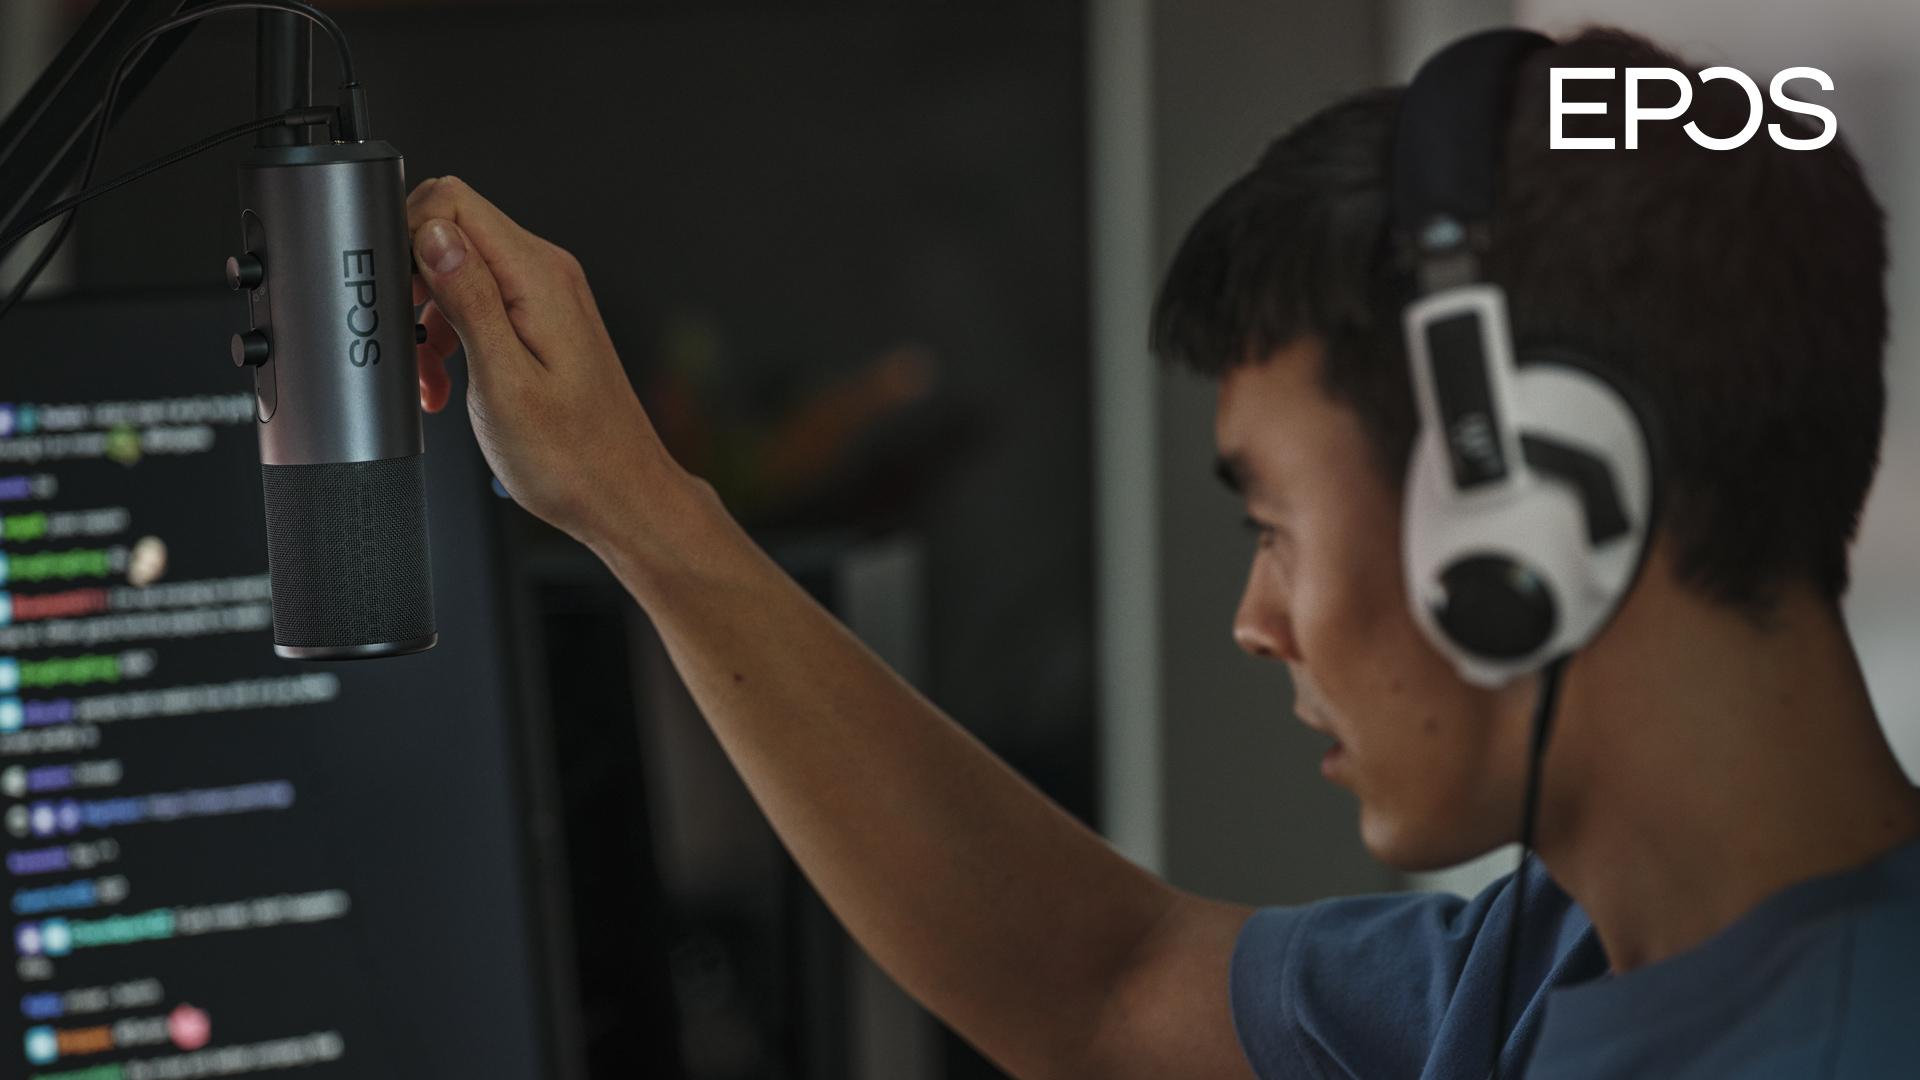 EPOS、スタジオ放送品質のゲーマー向け配信用マイク B20を発表 画像